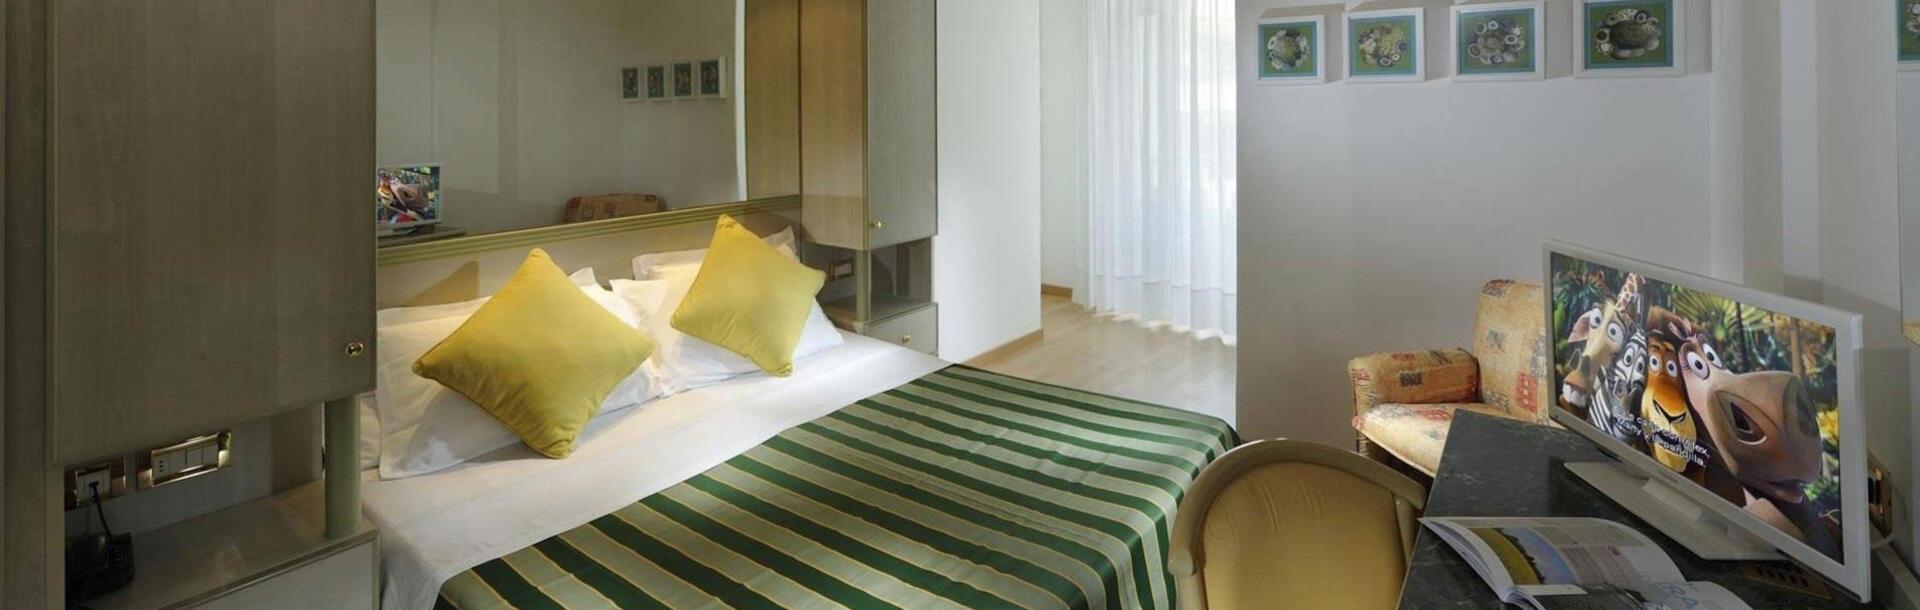 hotel-montecarlo hu family-szoba-bibione 013